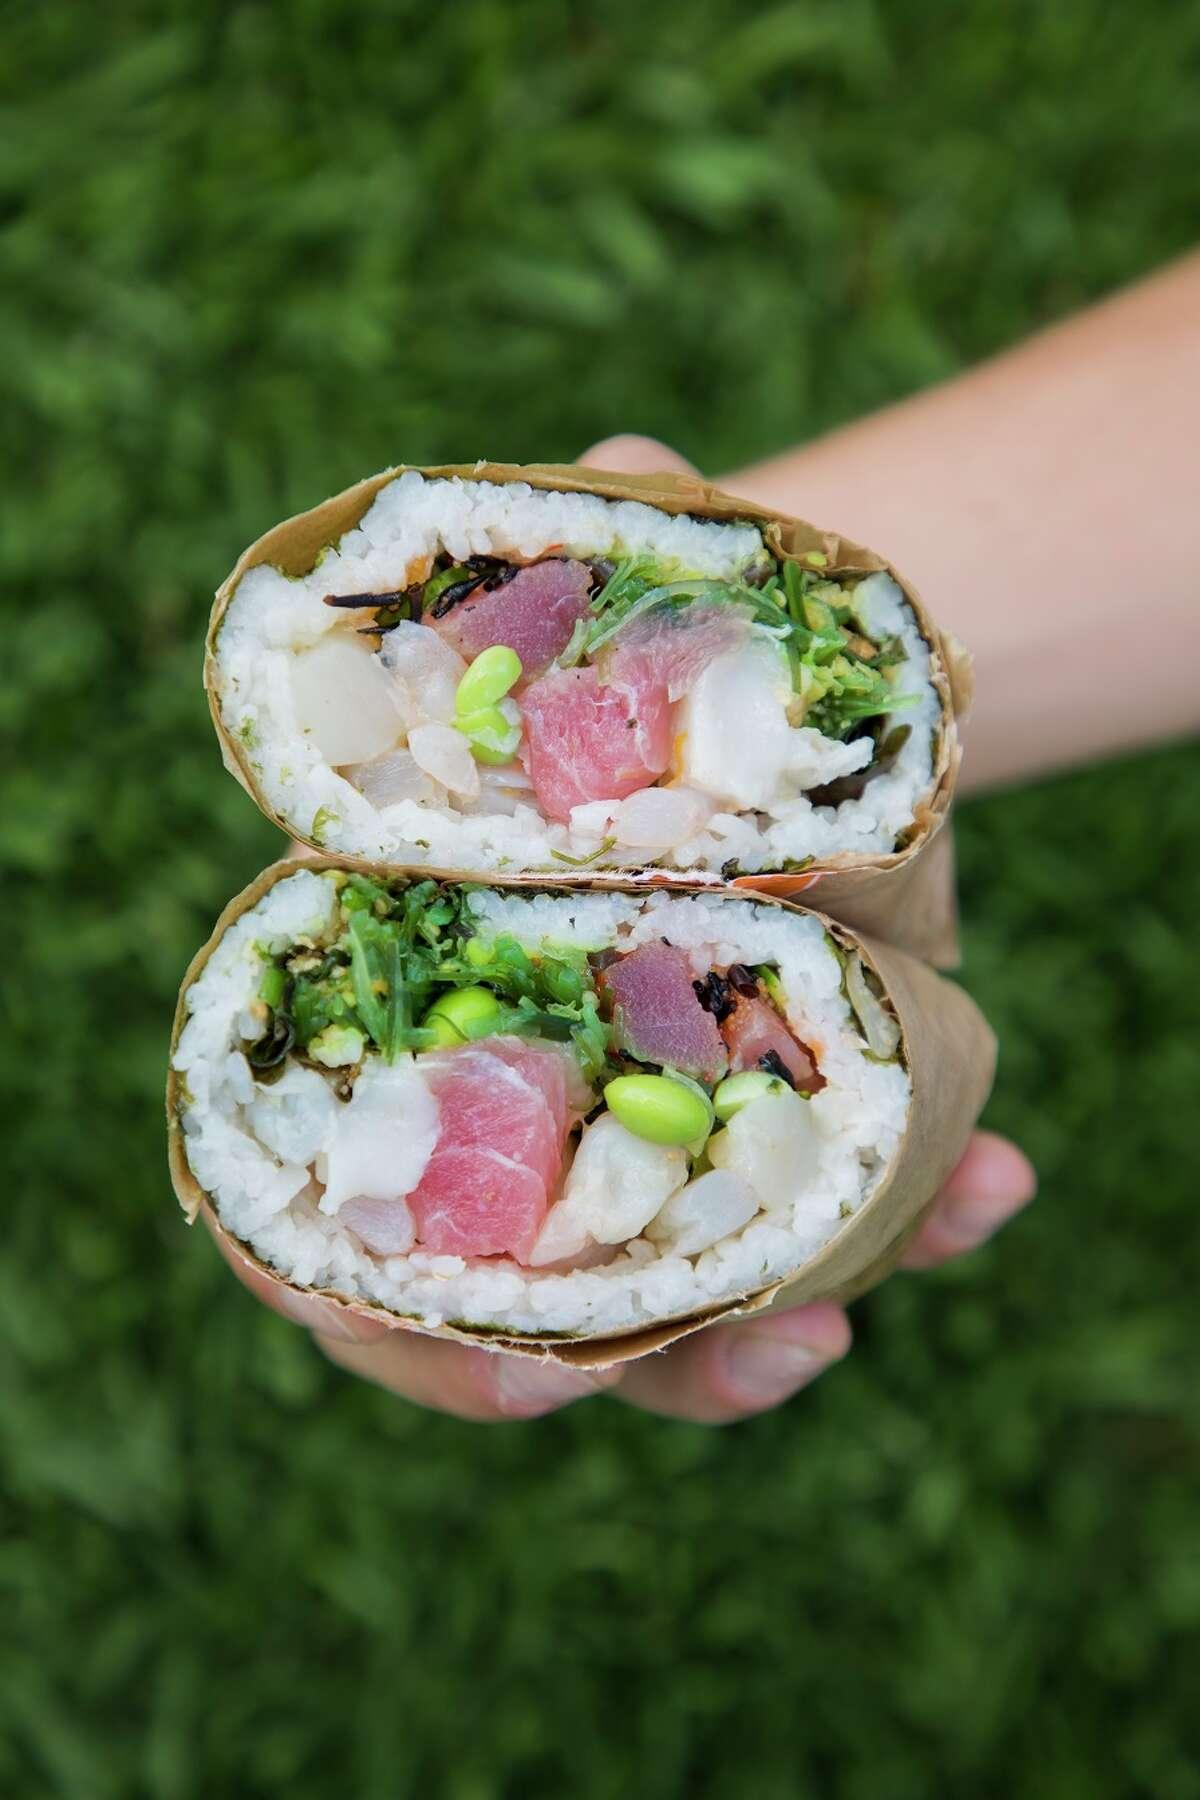 Poke burrito from Pokeworks, 213 Heights in Houston.